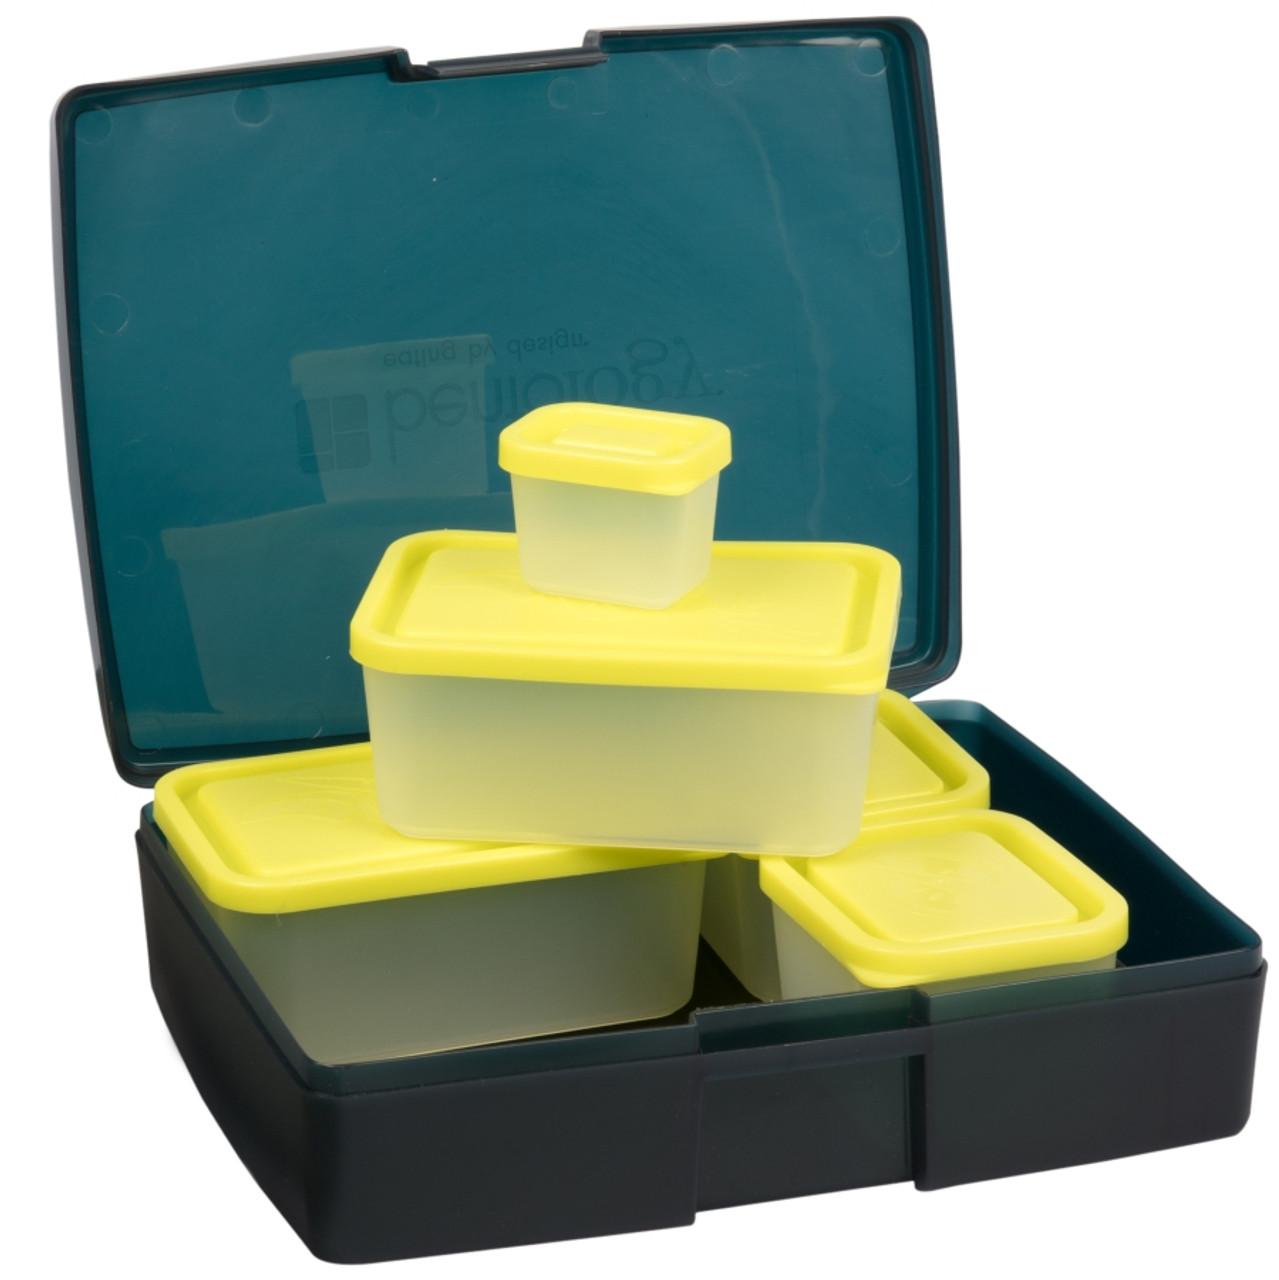 Bentology Bento Box Set (5 Containers Inside 1 Large), FINAL SALE